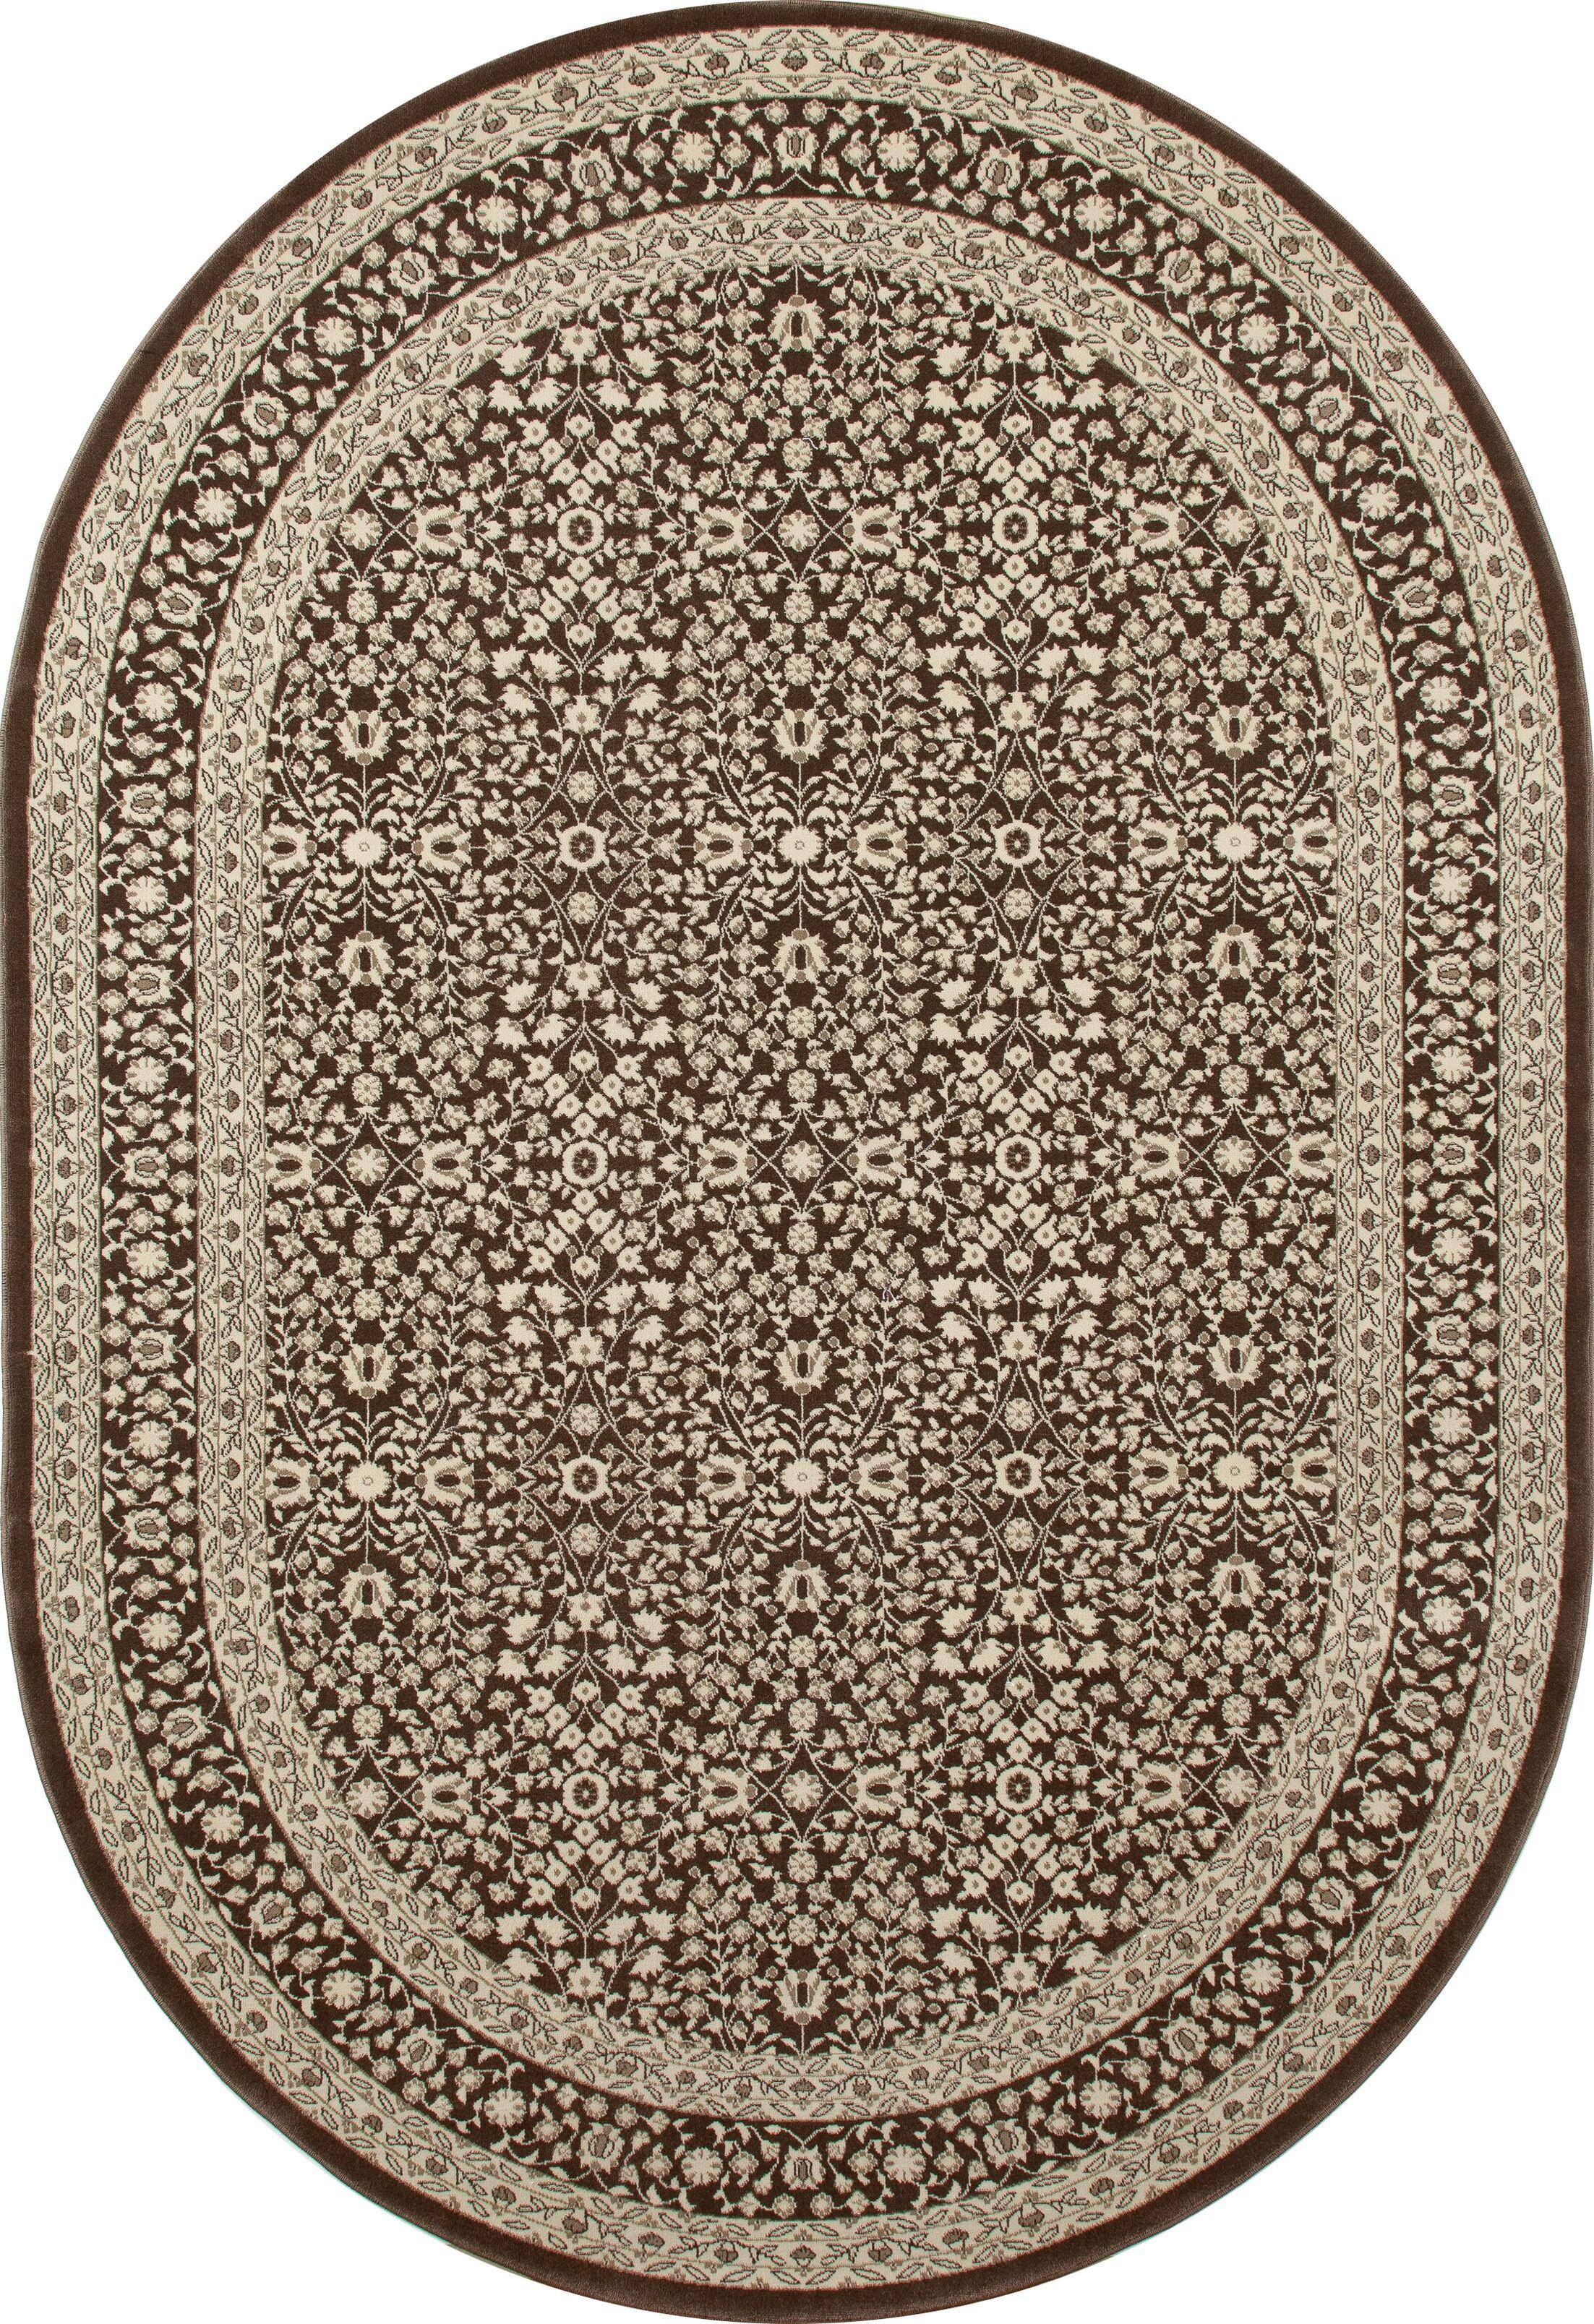 Lang Brown Area Rug Rug Size: OVAL 6'7 x 9'6